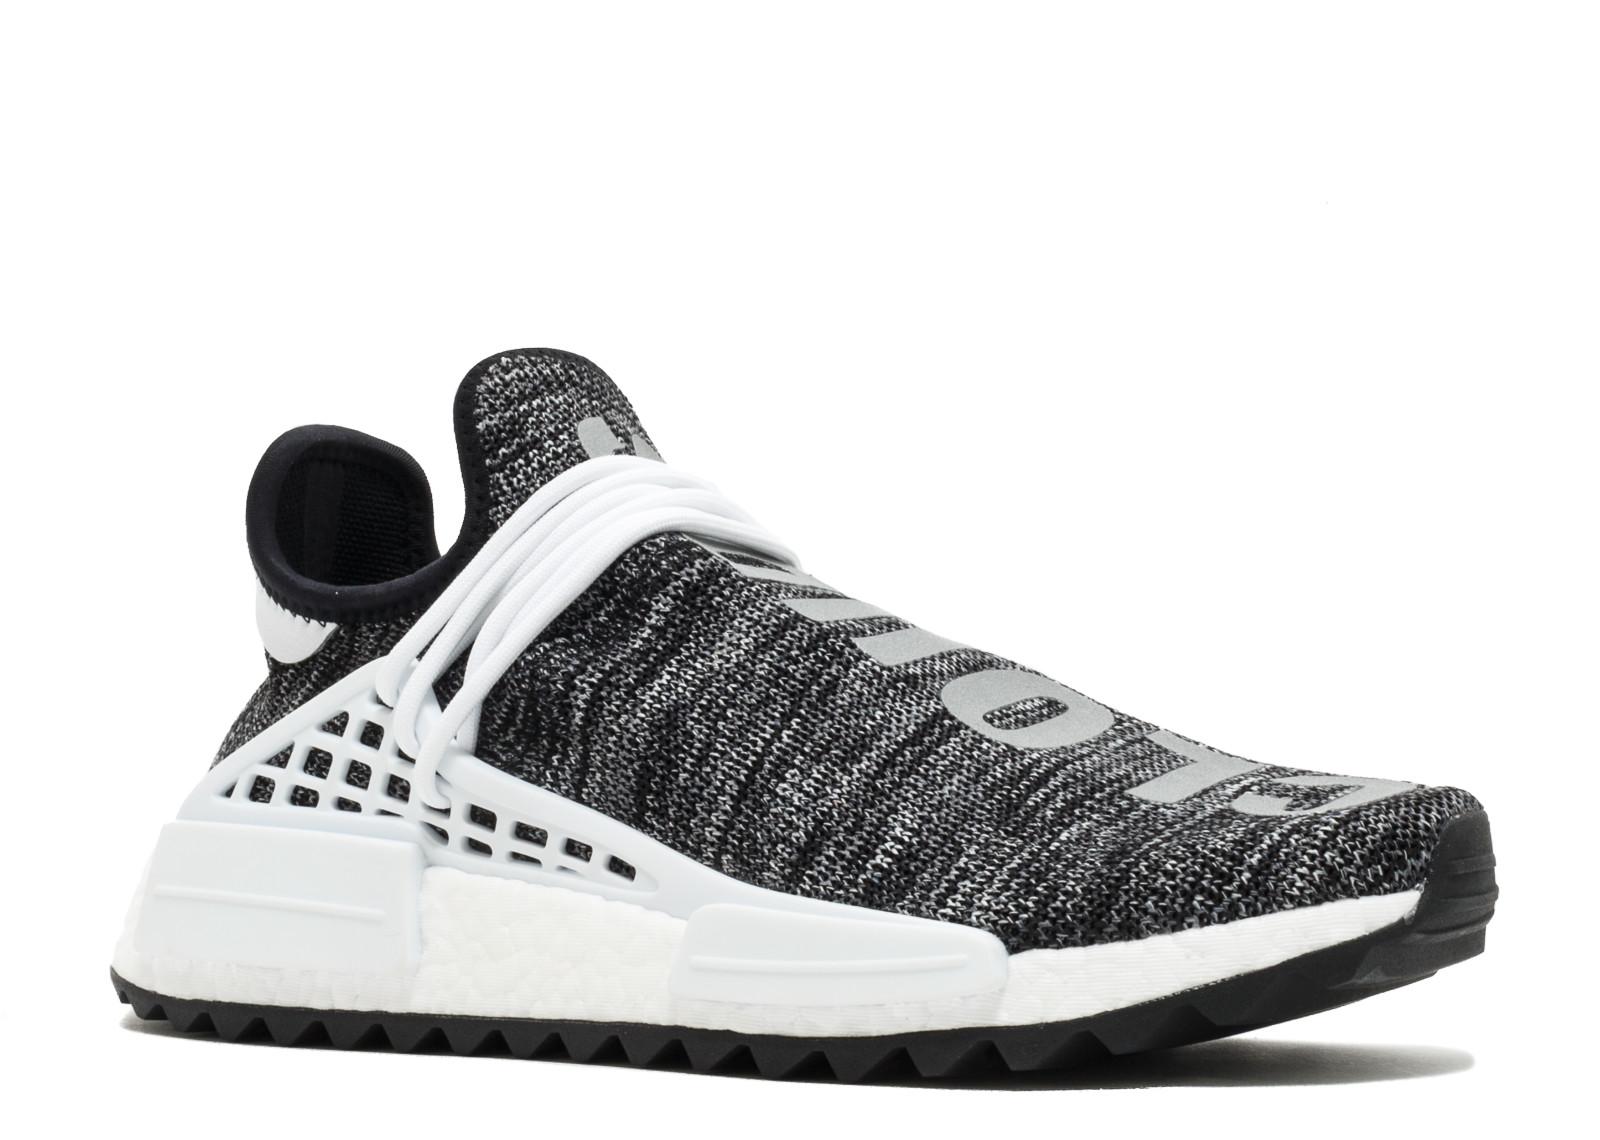 huge selection of e104a d8920 Adidas NMD Human Race Trail Pharrell Oreo - 1